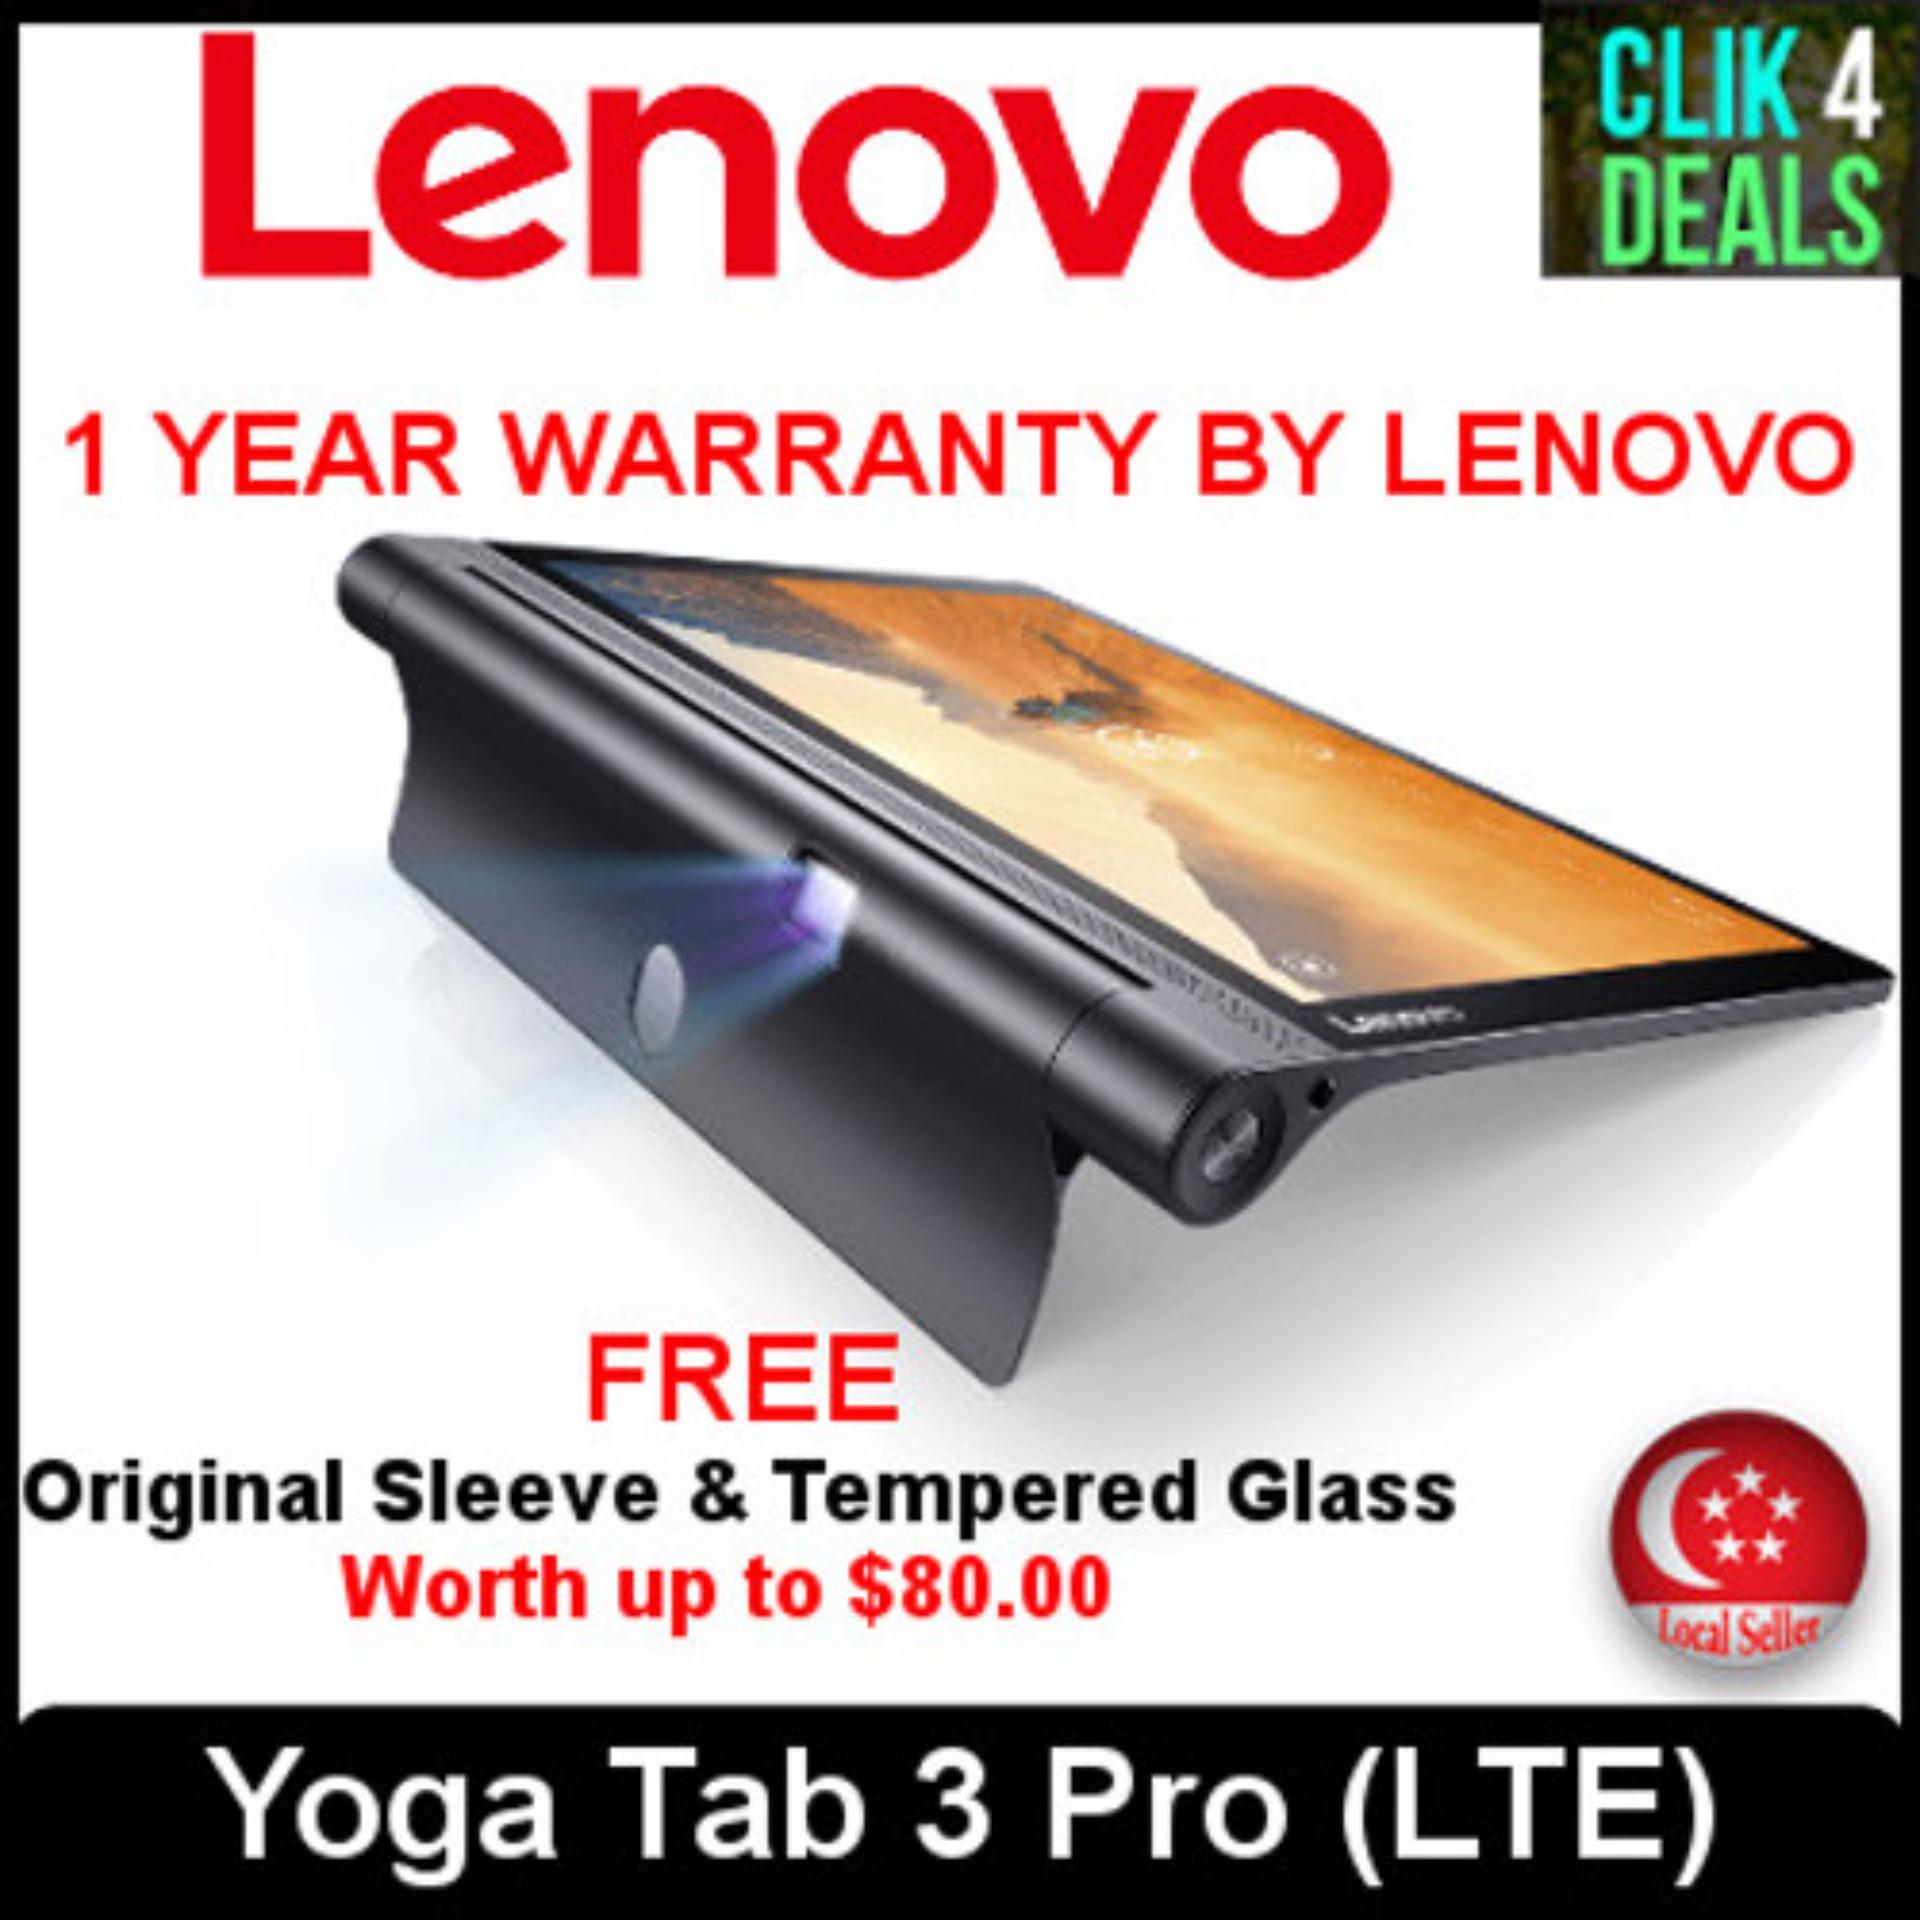 Lenovo Yoga Tab3 Pro Tablet / 10inch Display /Built-in Projector / 2+32GB / Refurbished Set w 1 month Warranty